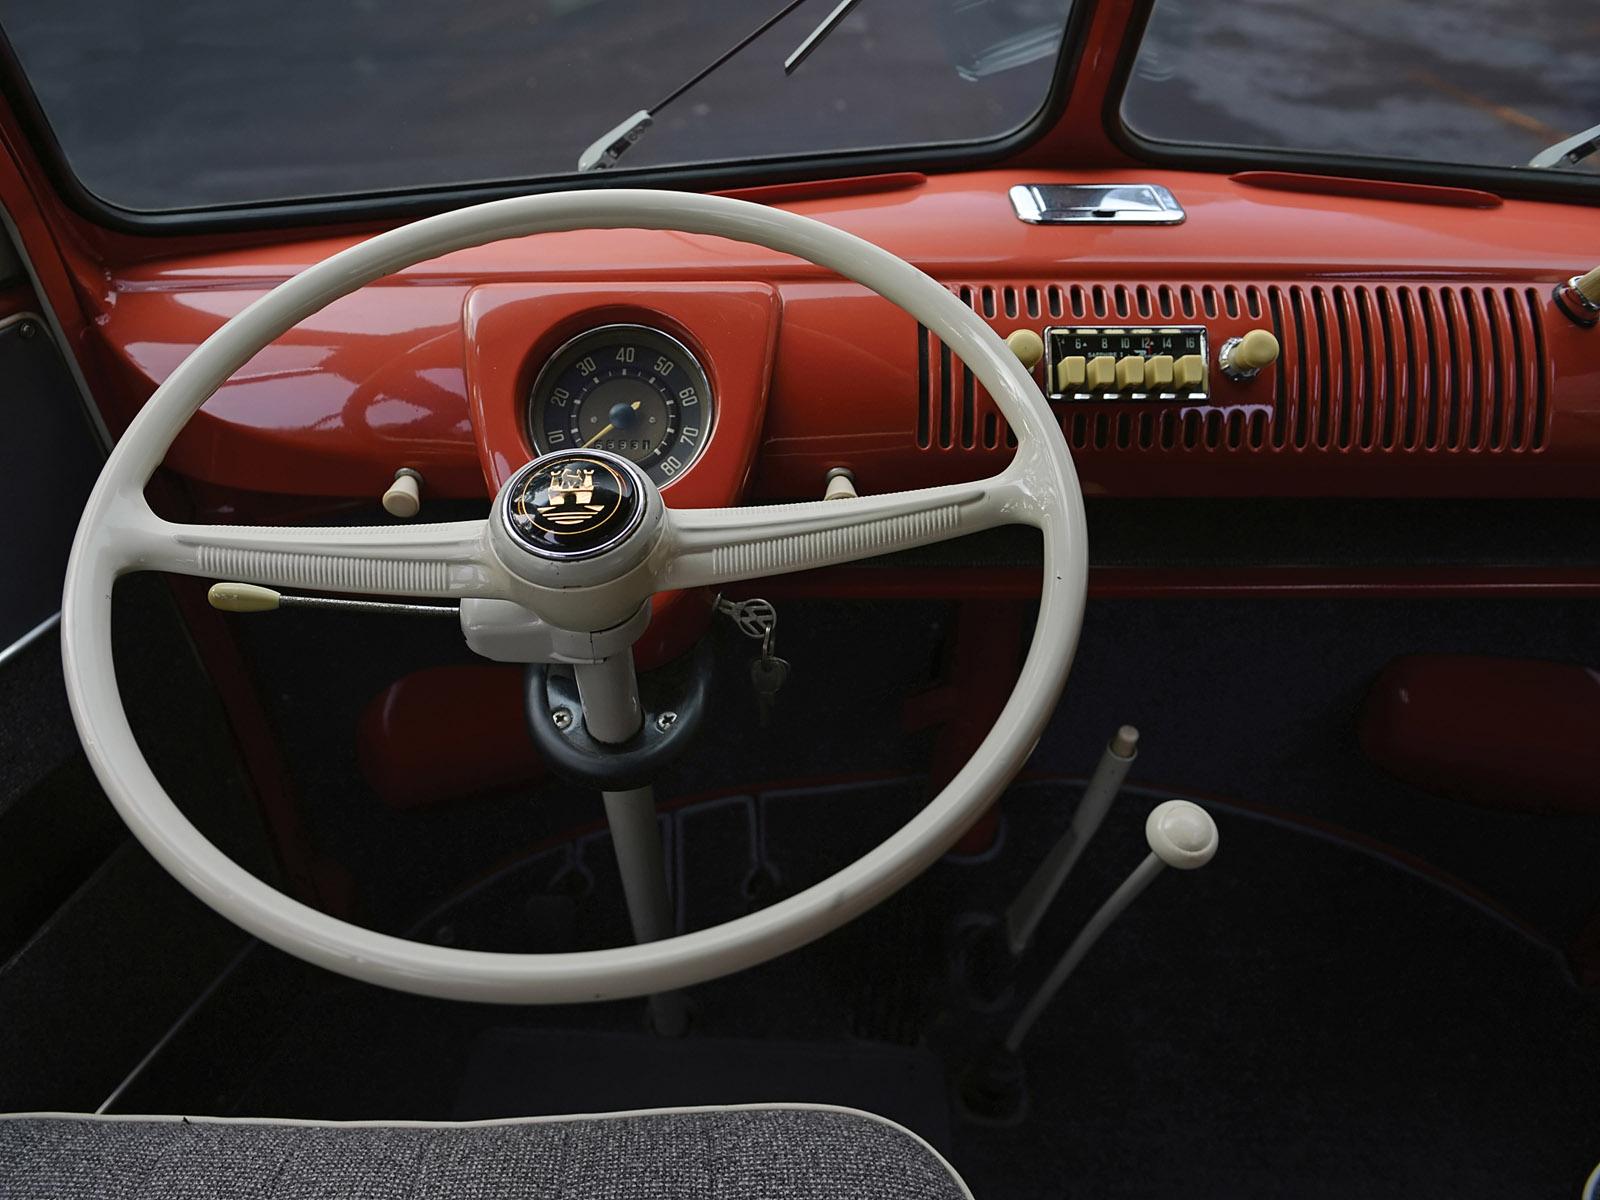 1951 Volkswagen T-1 Deluxe Samba Bus retro interior f ...